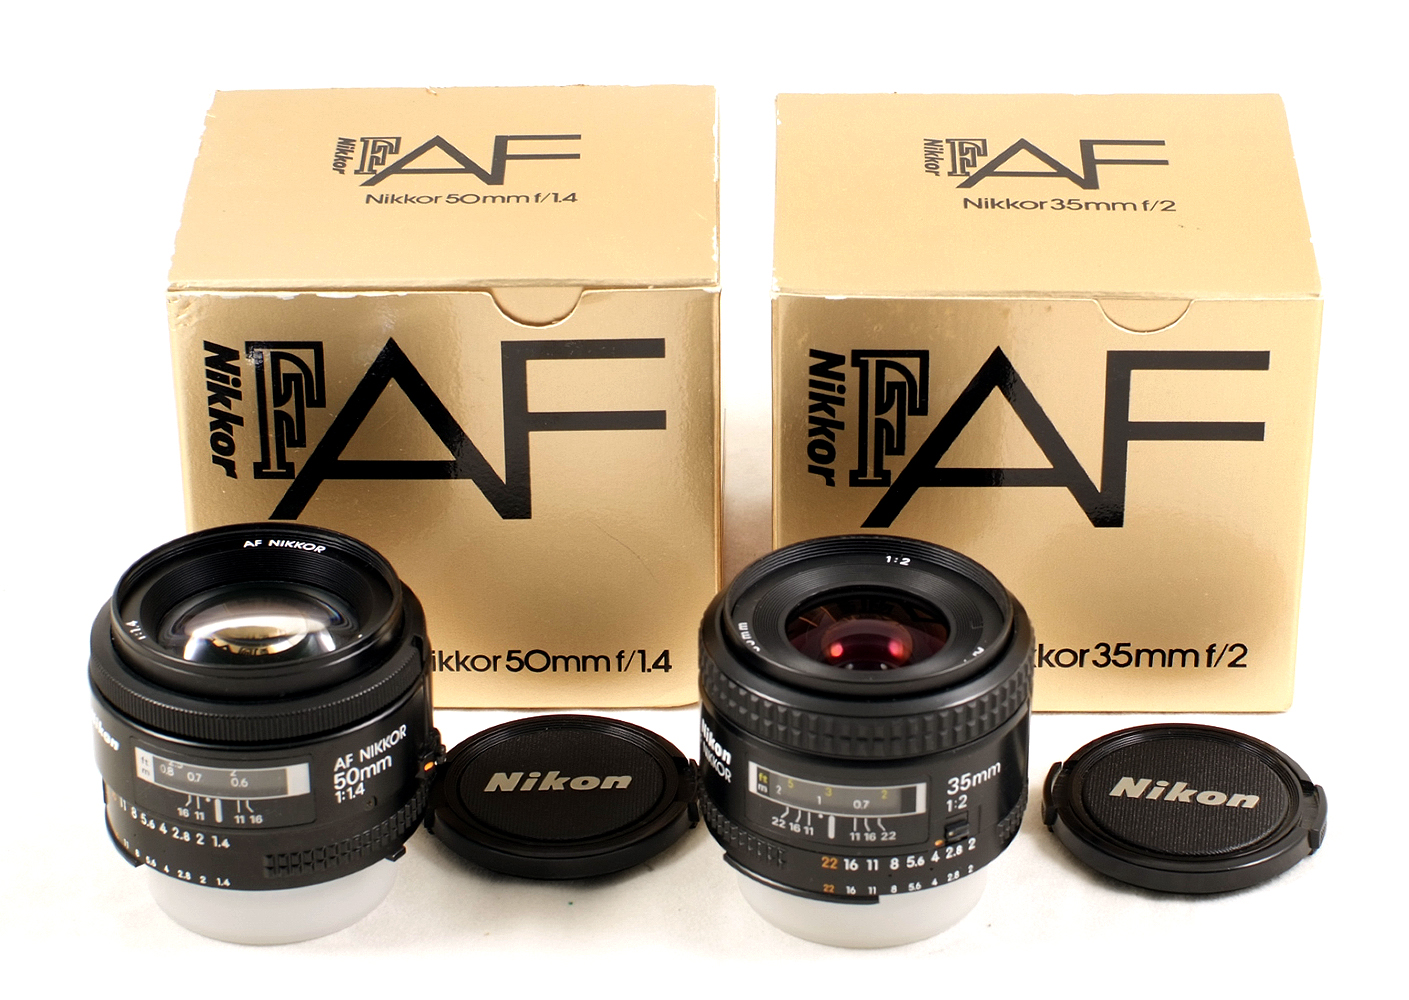 Lot 37 - Two Boxed Nikon Auto Focus Lenses. Nikkor 50mm f1.